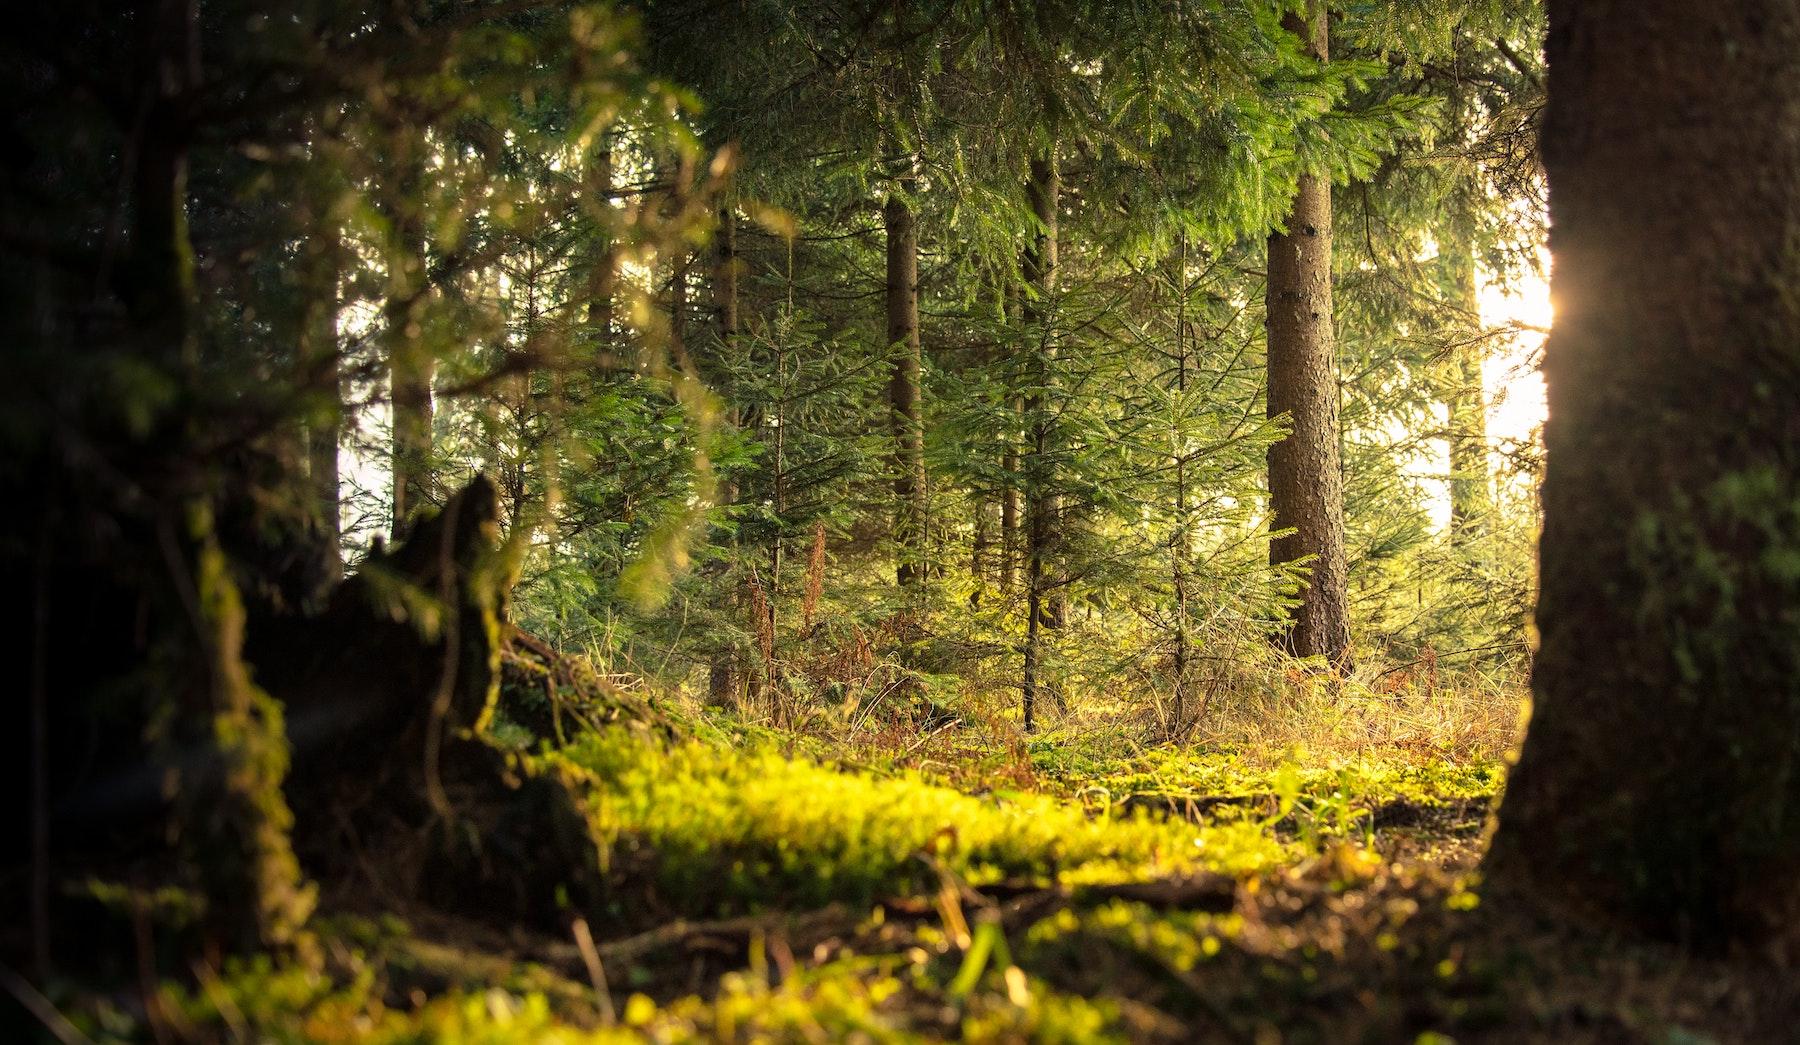 conifer-daylight-environment-338936 copy.jpg